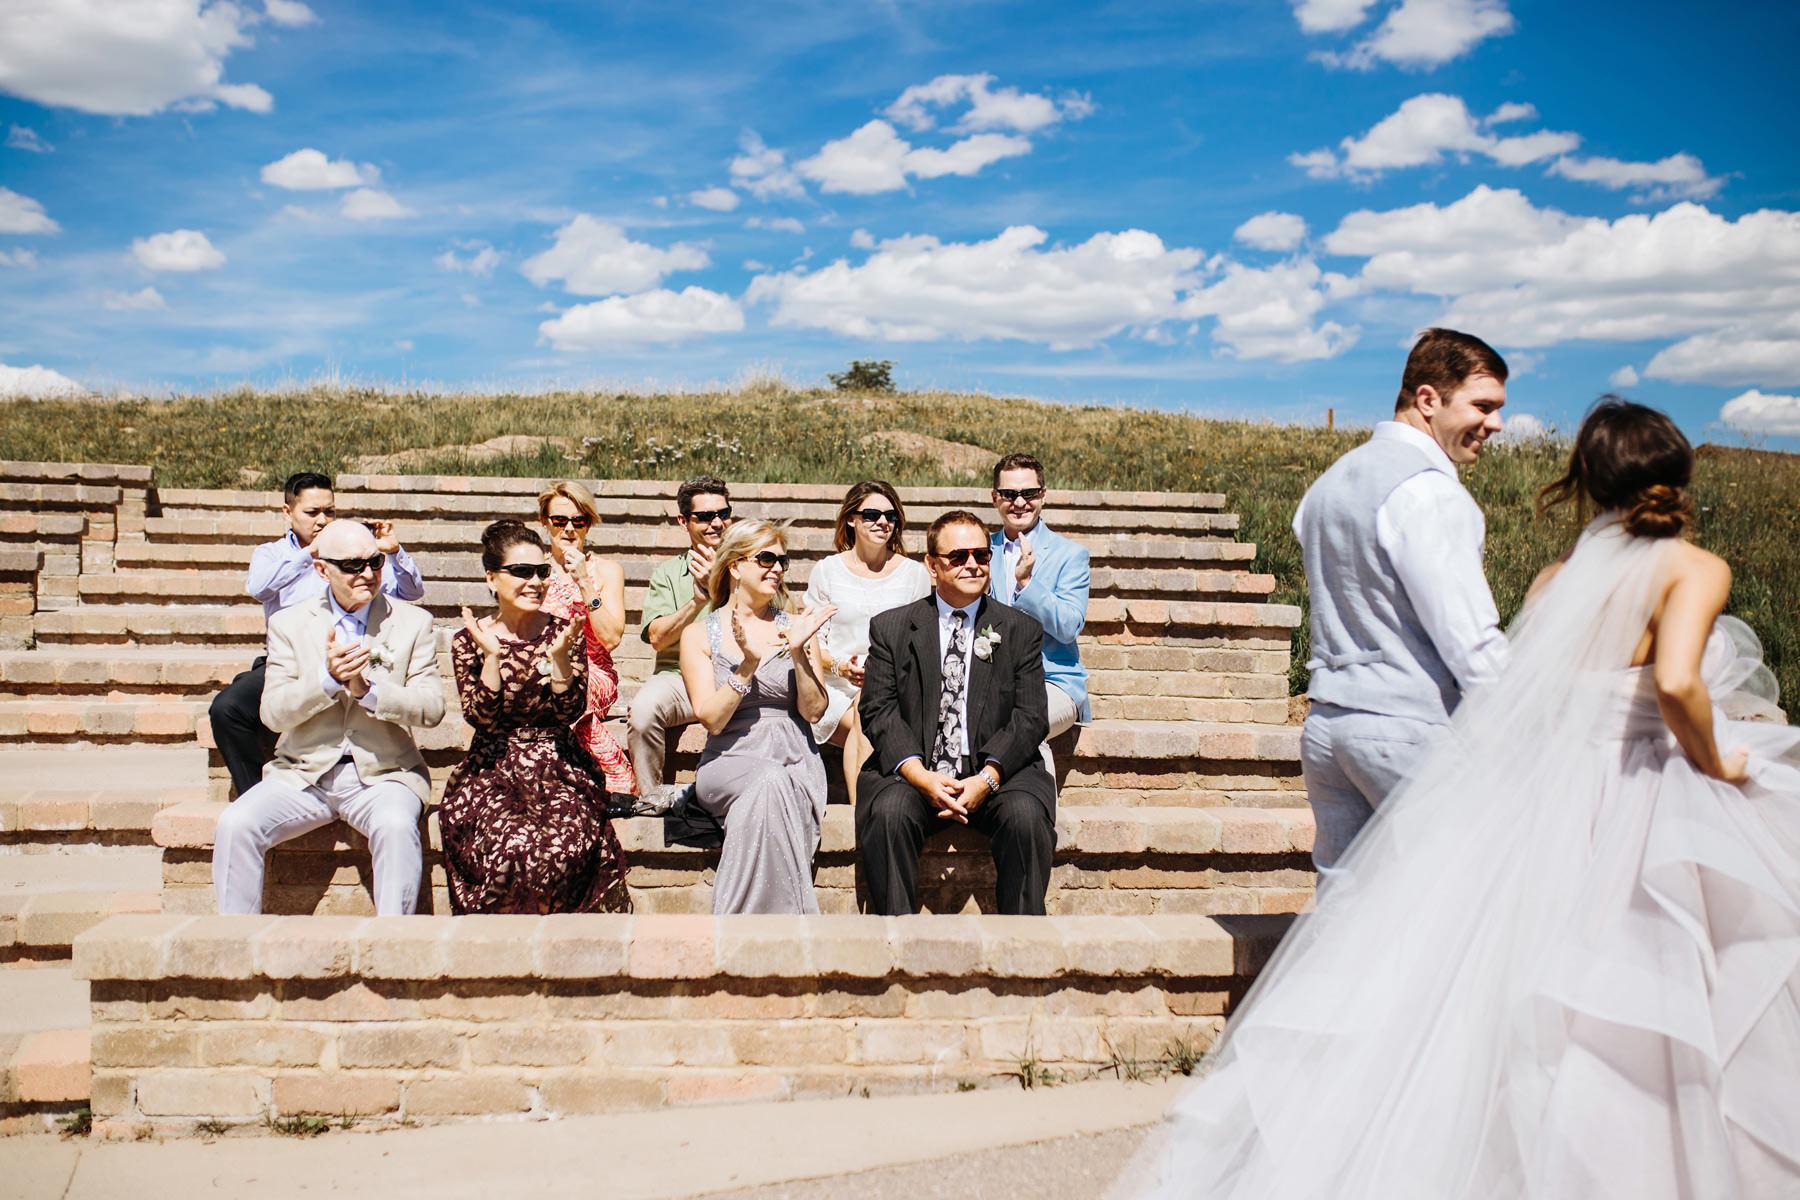 Vail Colorado Wedding Deck_ Kindling Wedding Photography41.JPG